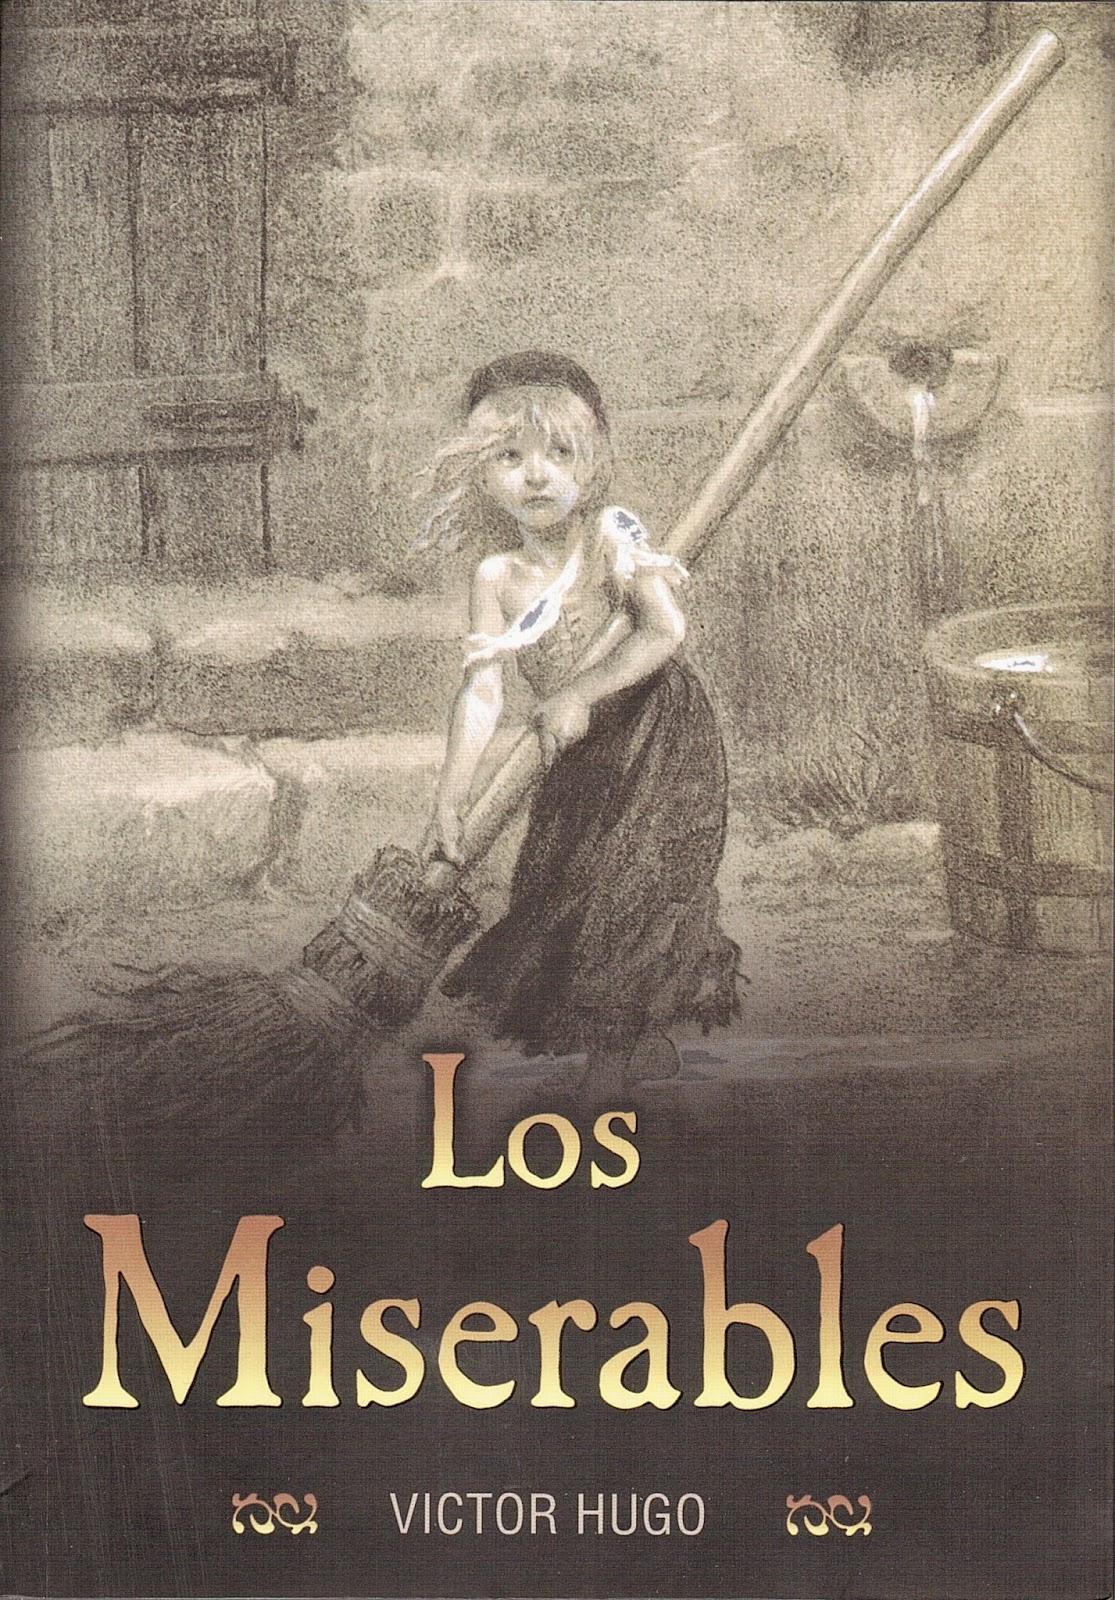 http://lavidadeunalectoraa.blogspot.mx/2015/03/resena-los-miserables-de-victor-hugo.html